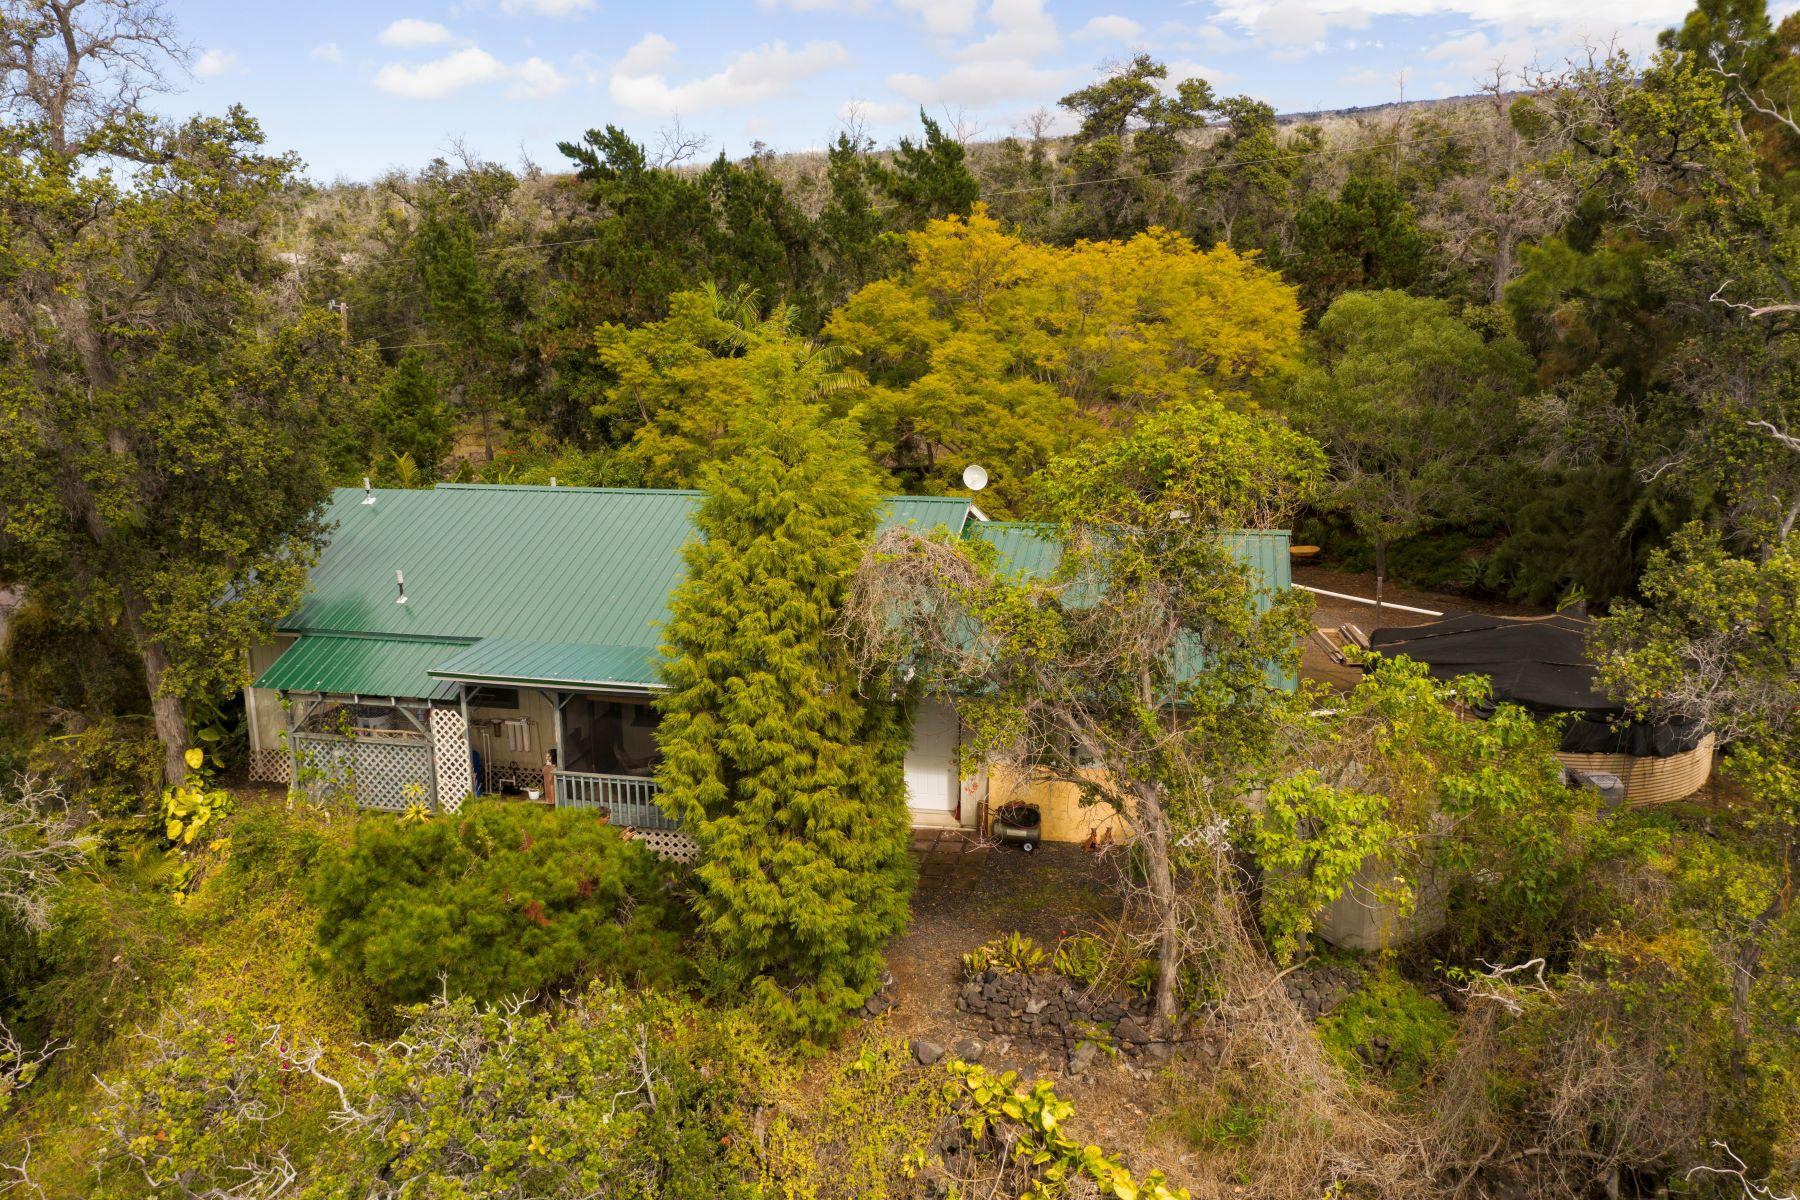 Single Family Homes for Sale at 92-1754 Kona Drive, Ocean View, HI 96704 92-1754 Kona Drive Ocean View, Hawaii 96704 United States